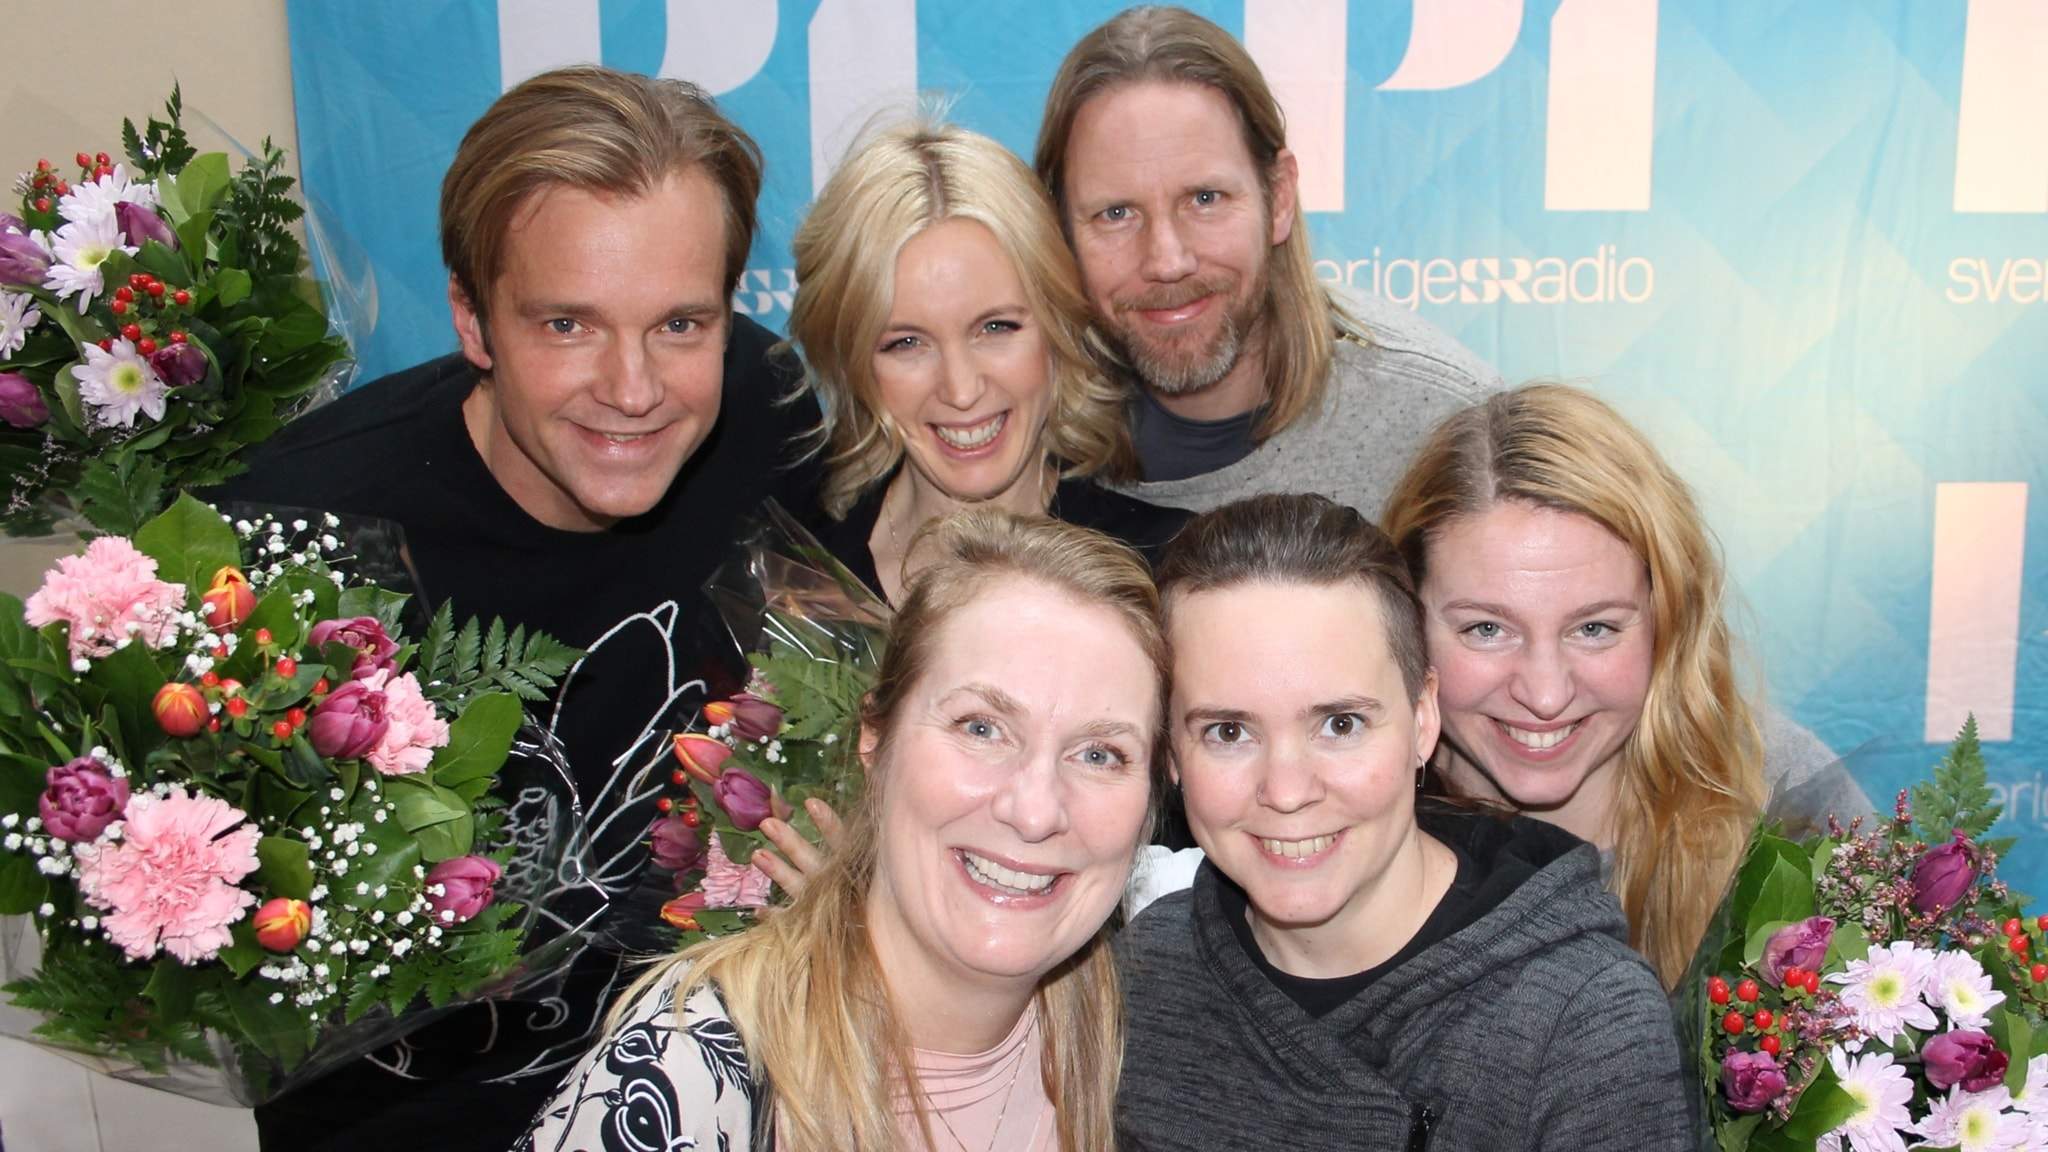 Henrik Johnsson, Jenny Strömstedt, Kristoffer Triumf, Isobel Hadley-Kamptz, Annika Lantz och Sara Lövestam.